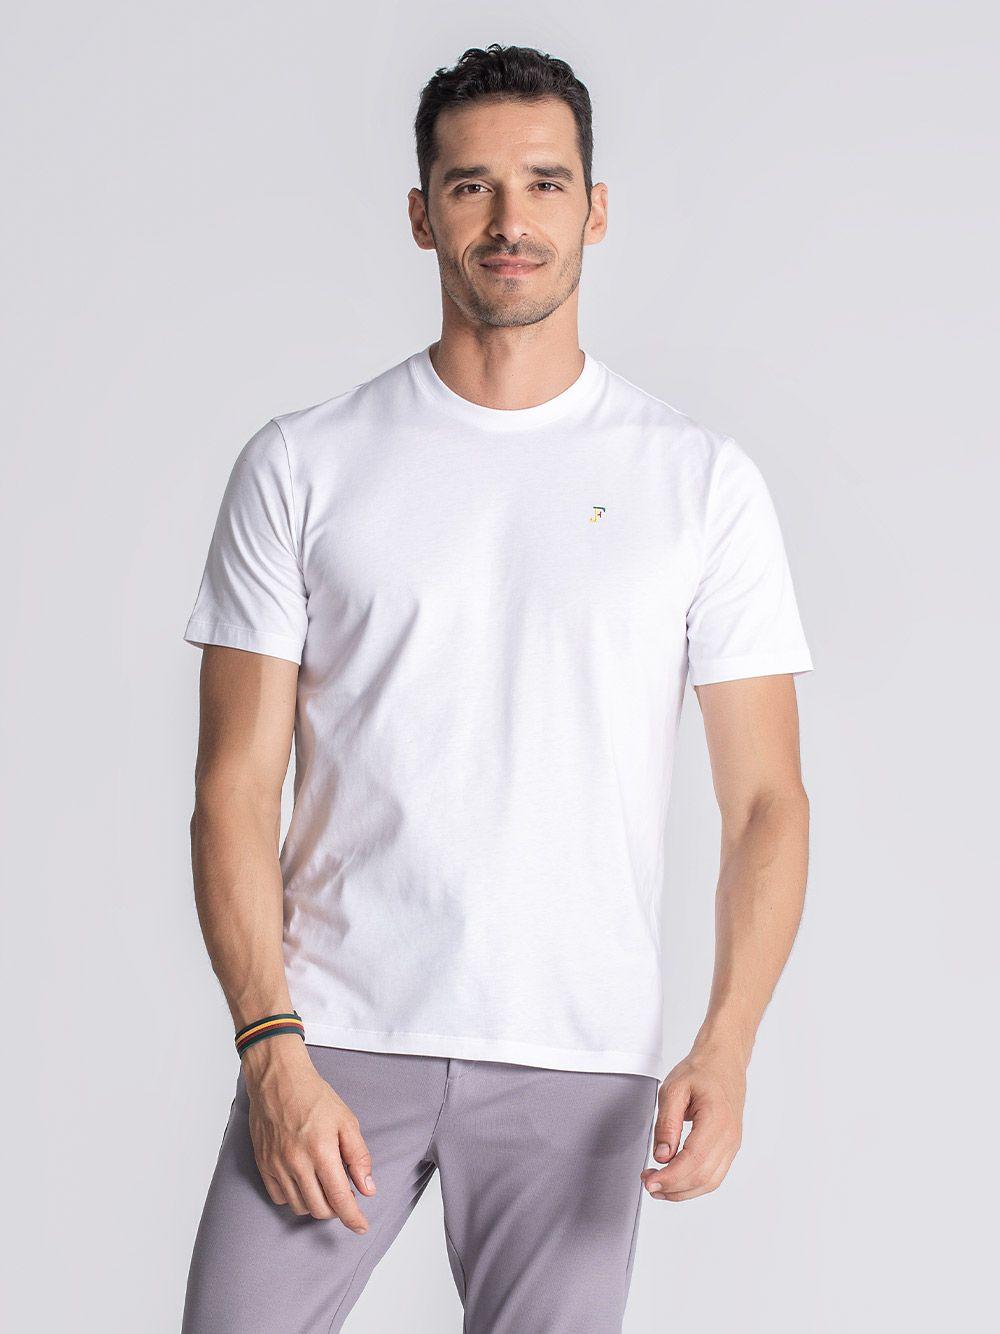 T-shirt Cataldi Branco   JEF